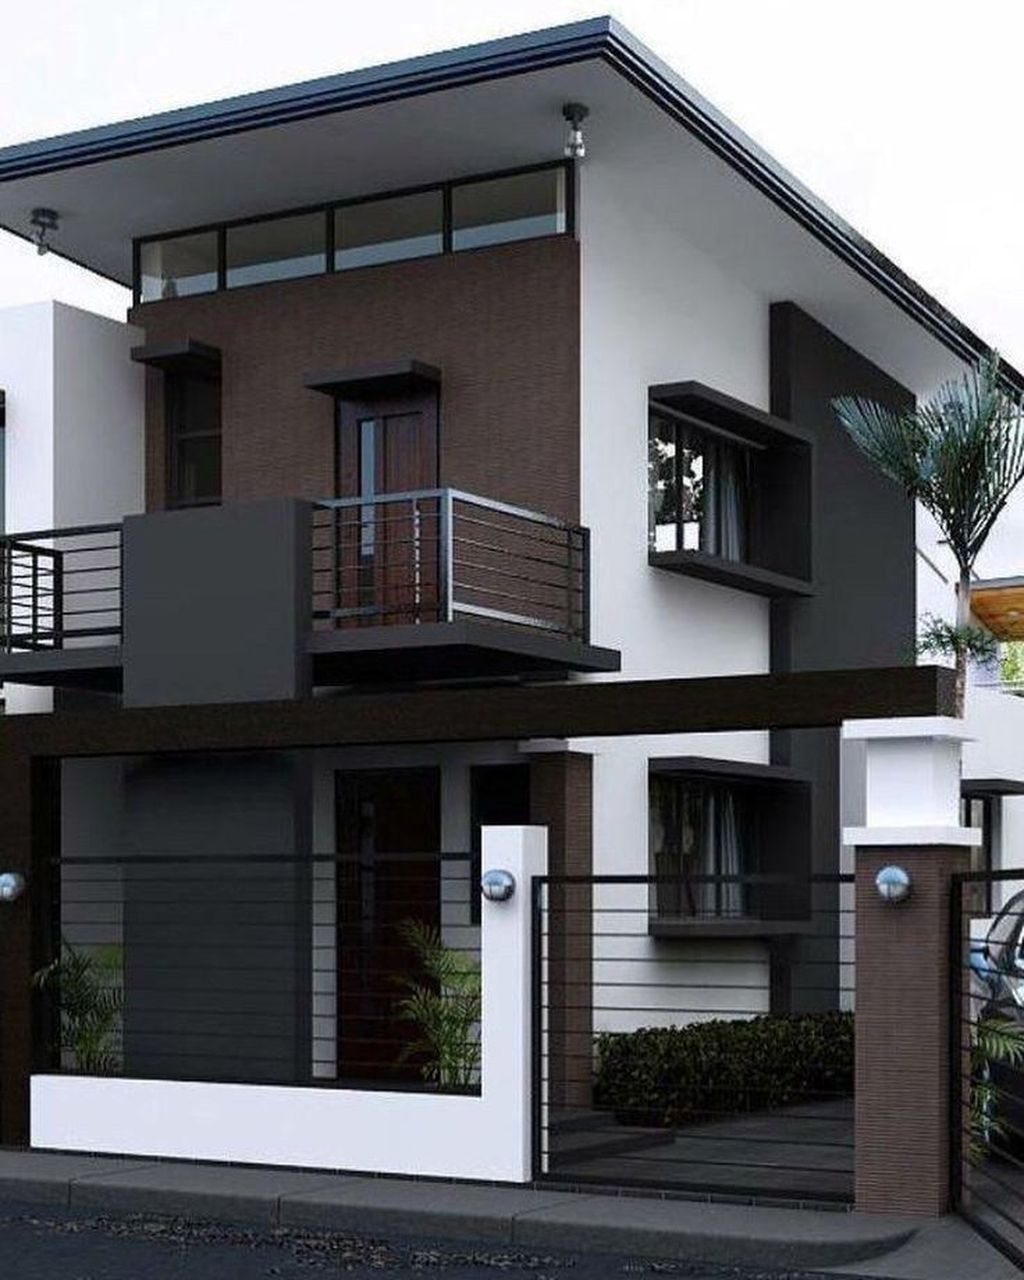 37 Stunning Contemporary House Exterior Design Ideas You Should Copy In 2020 Duplex House Design Bungalow House Design Modern Small House Design